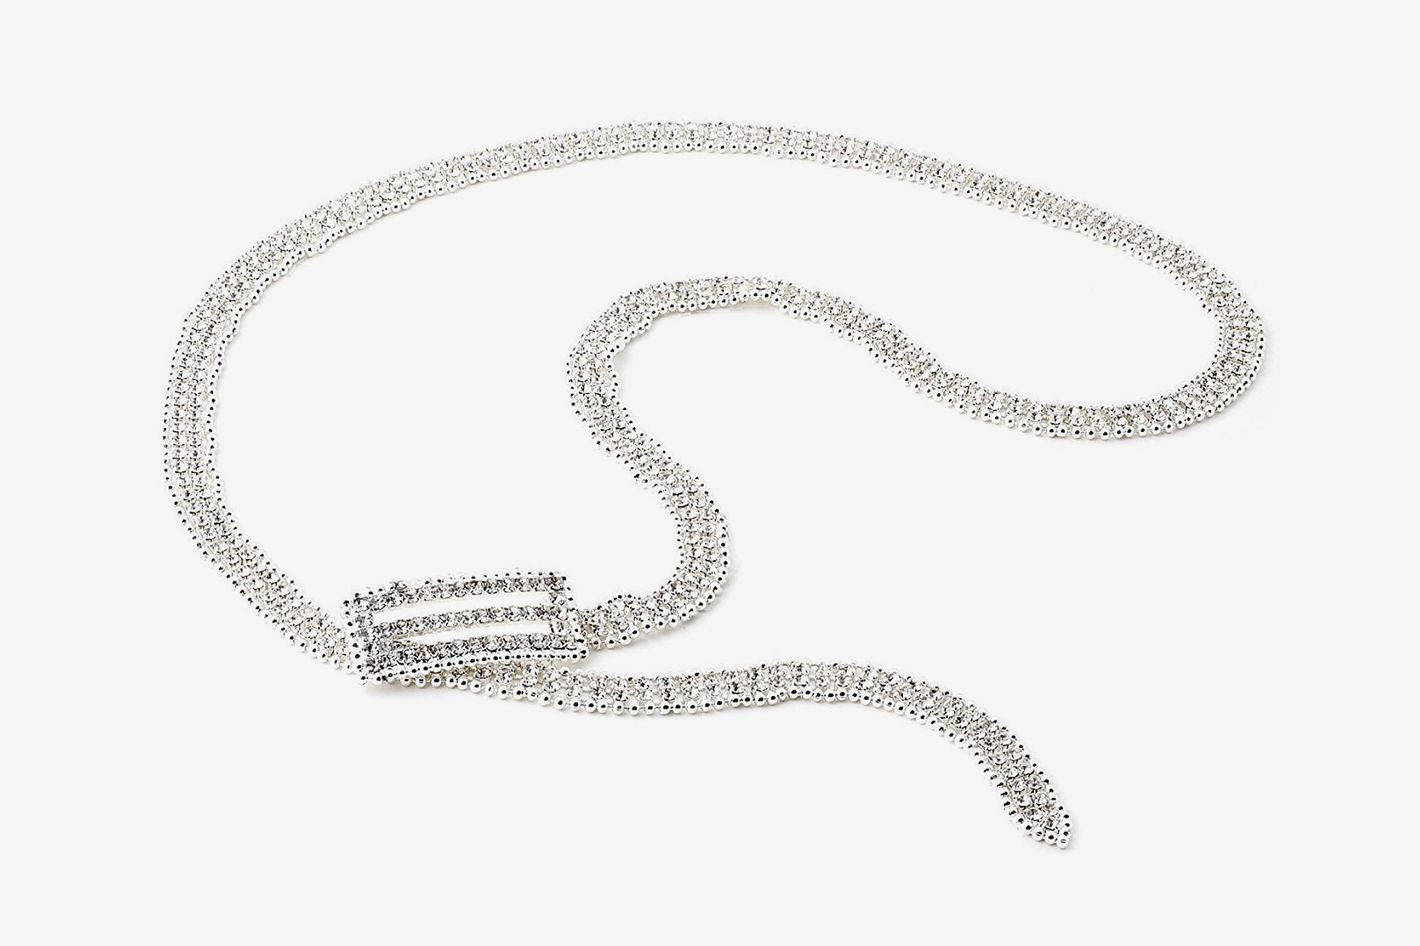 Silver Crystal Rhinestone Silver Beads Belt